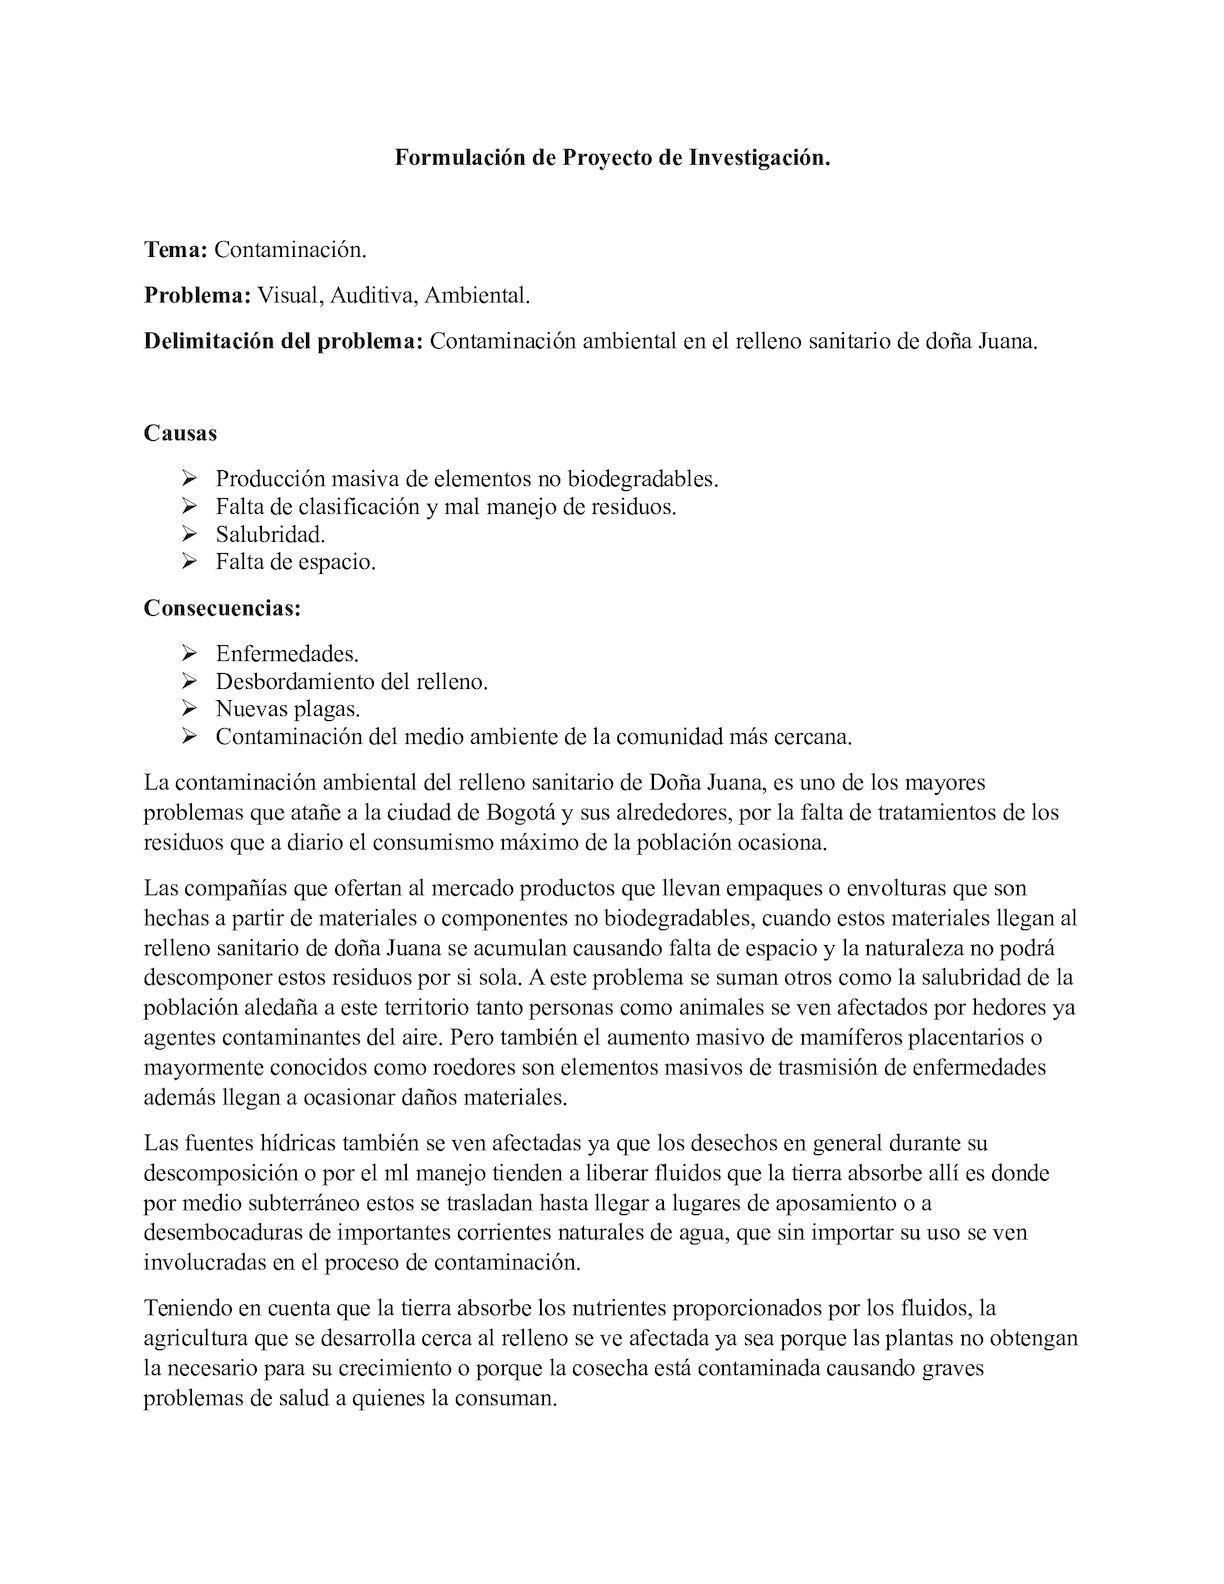 Formulación De Proyecto De Investigación (Relleno Sanitario De Doña Juana)